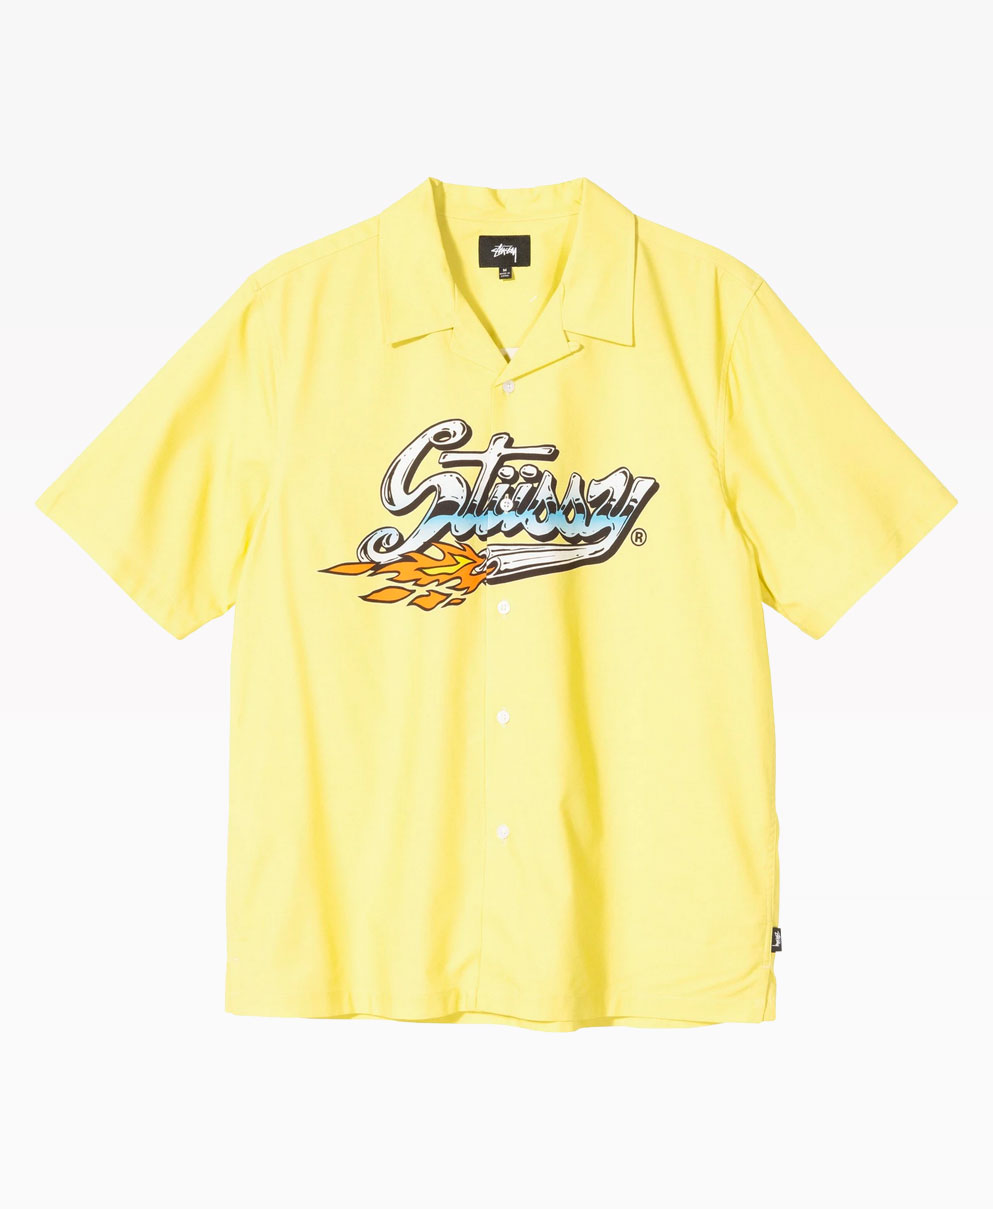 Stussy Cruising Shirt Front